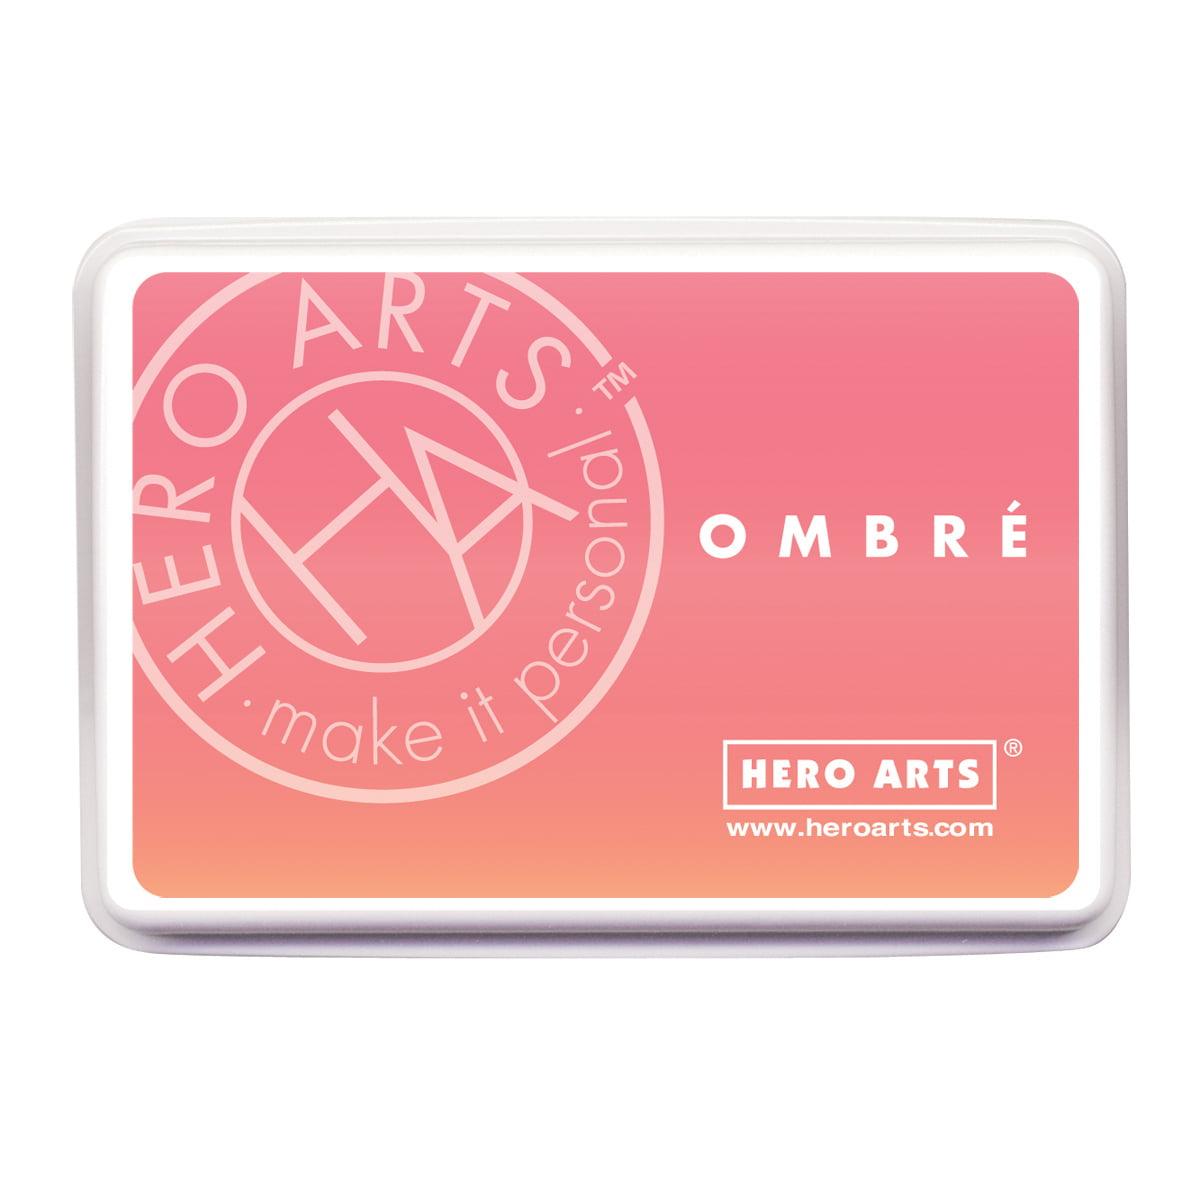 Hero Arts Ombre Ink Pad-Light To Dark Peach